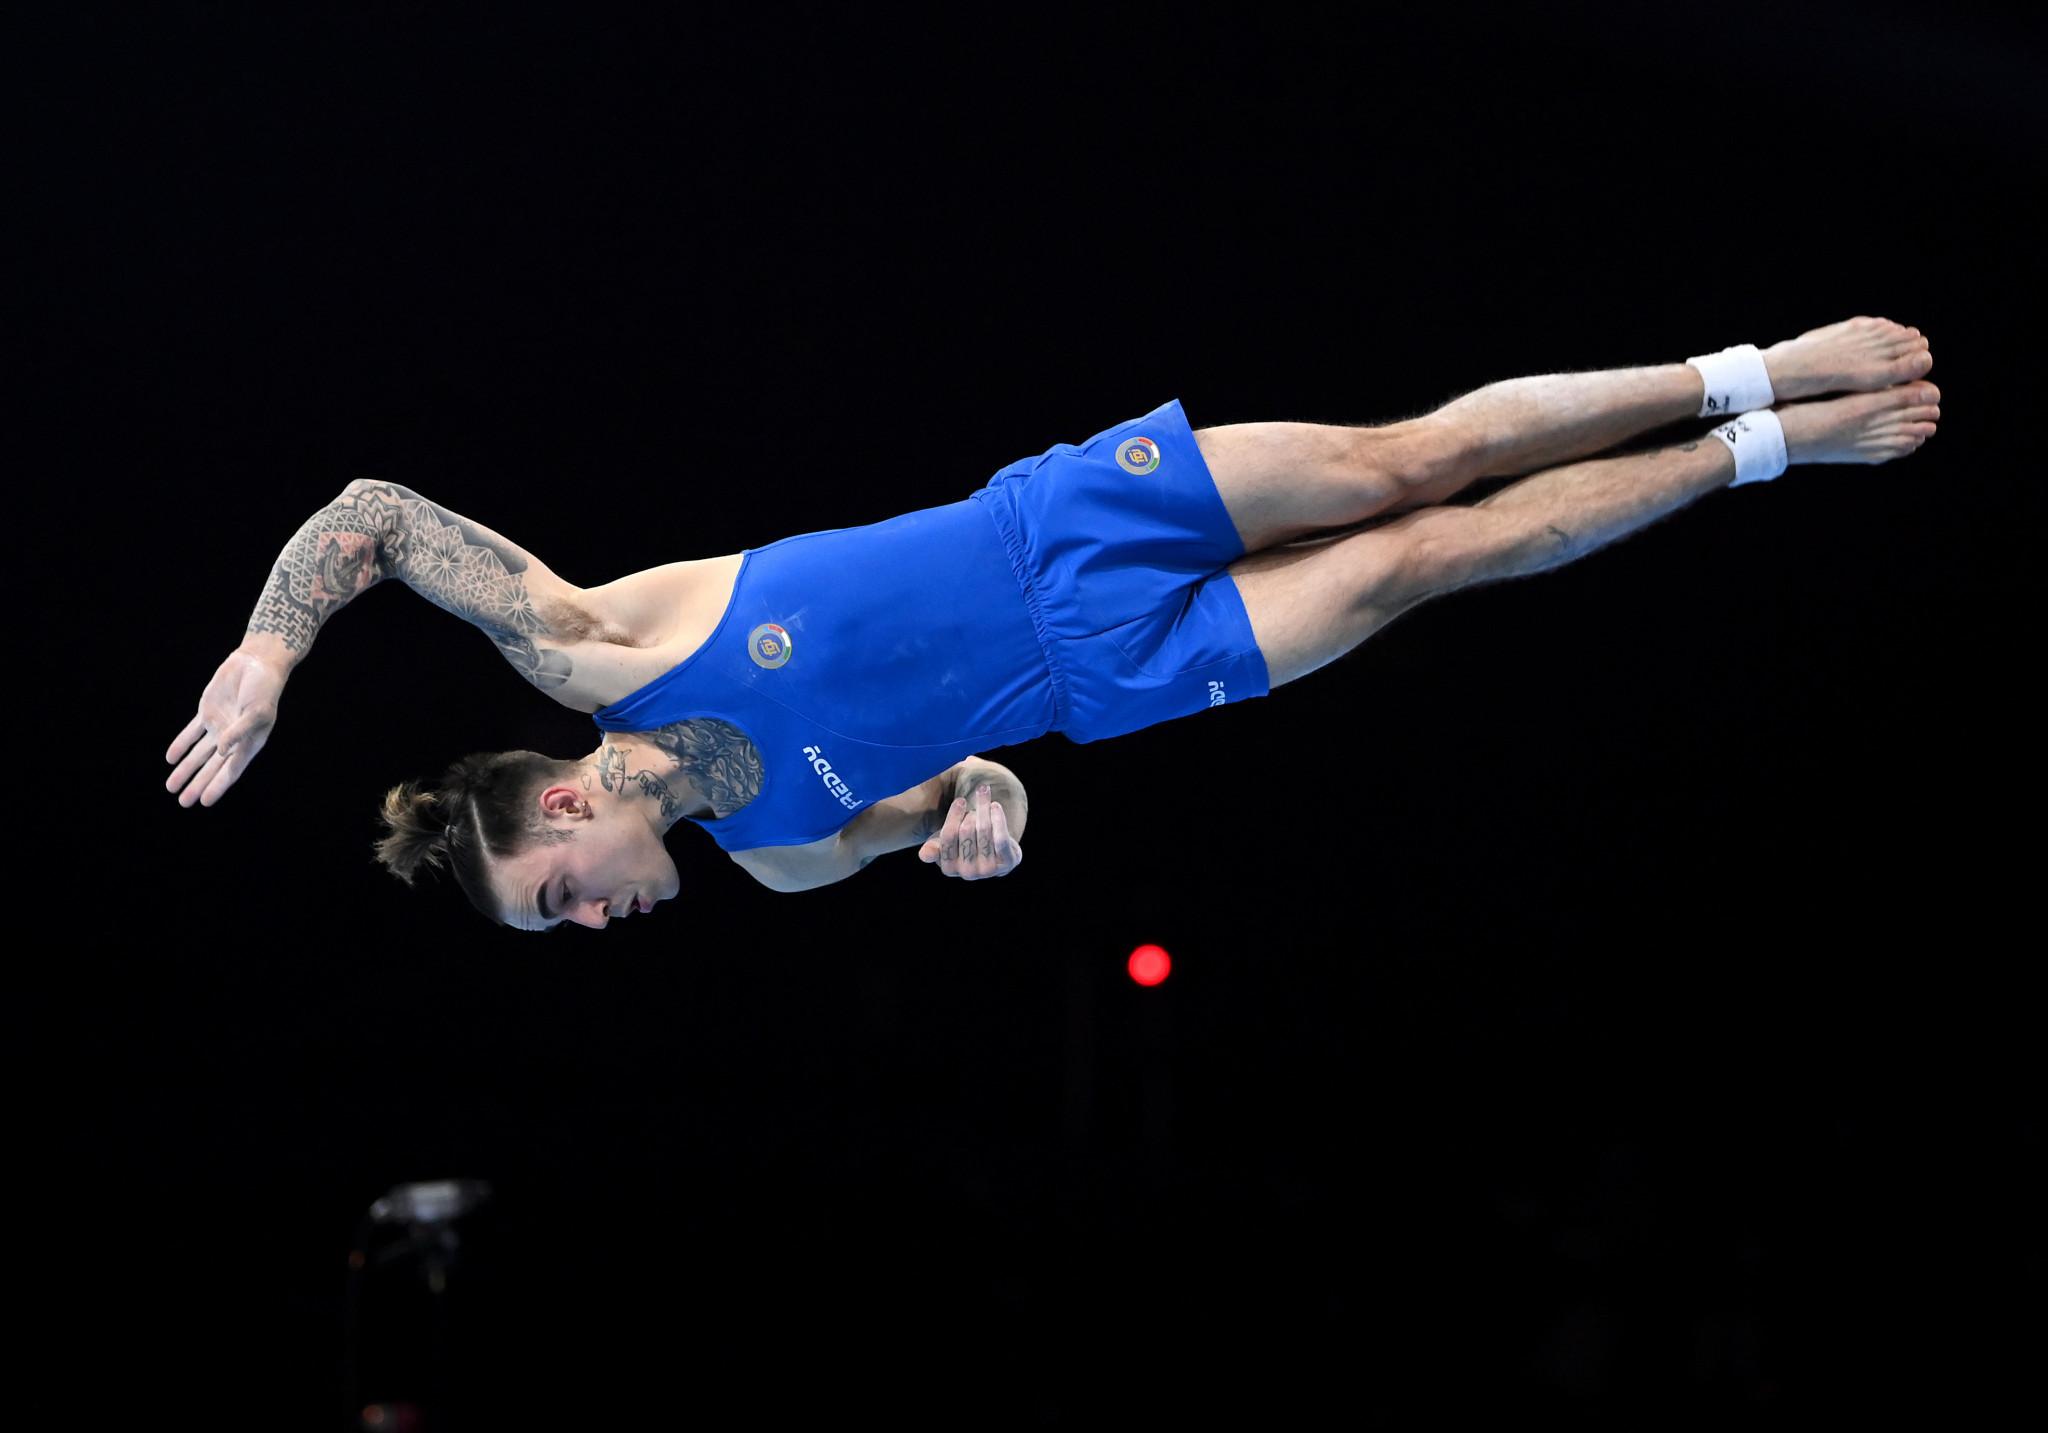 Naples to host 2024 European Artistic Gymnastics Championships